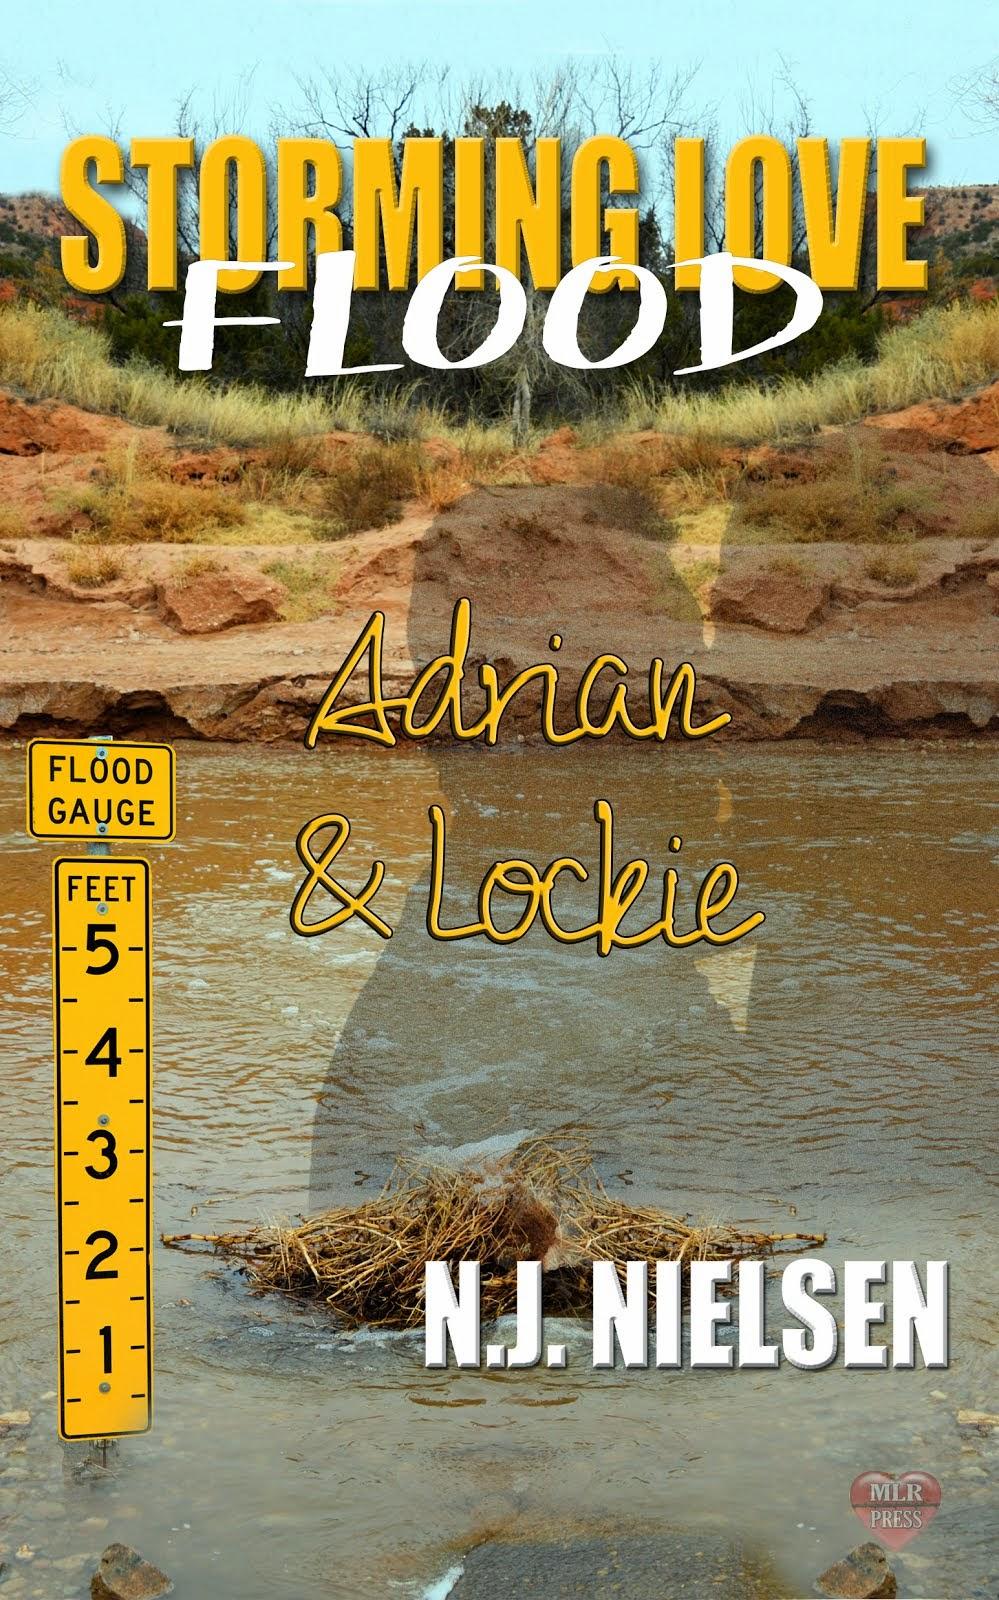 Storming Love: Floods